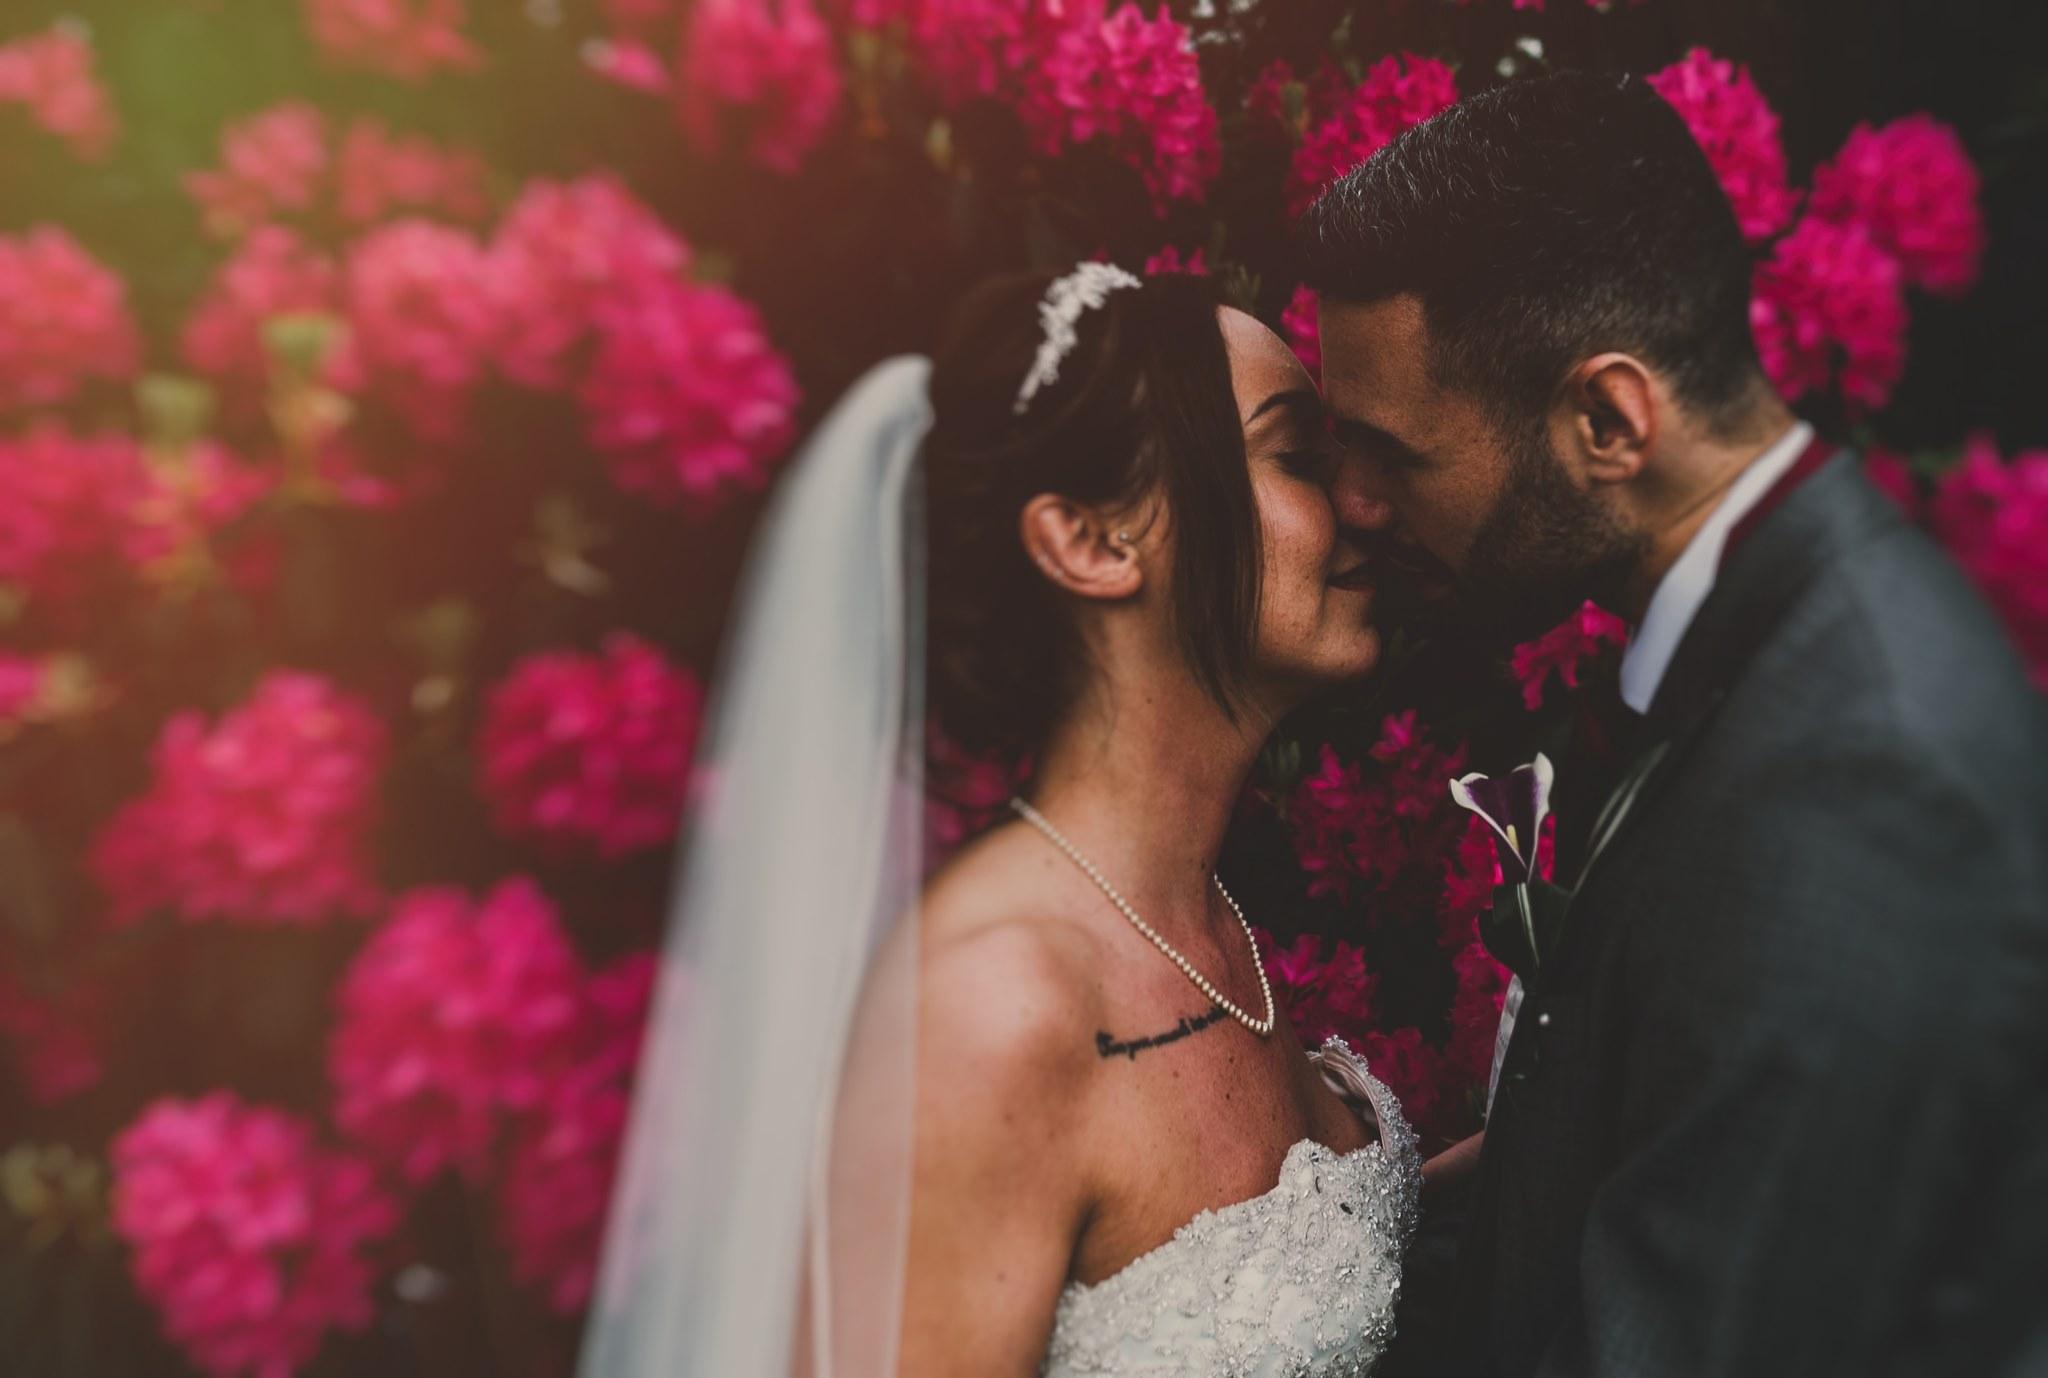 Alternative-wedding-photography-in-manchester-jade-maguire-photograhy (20).jpg